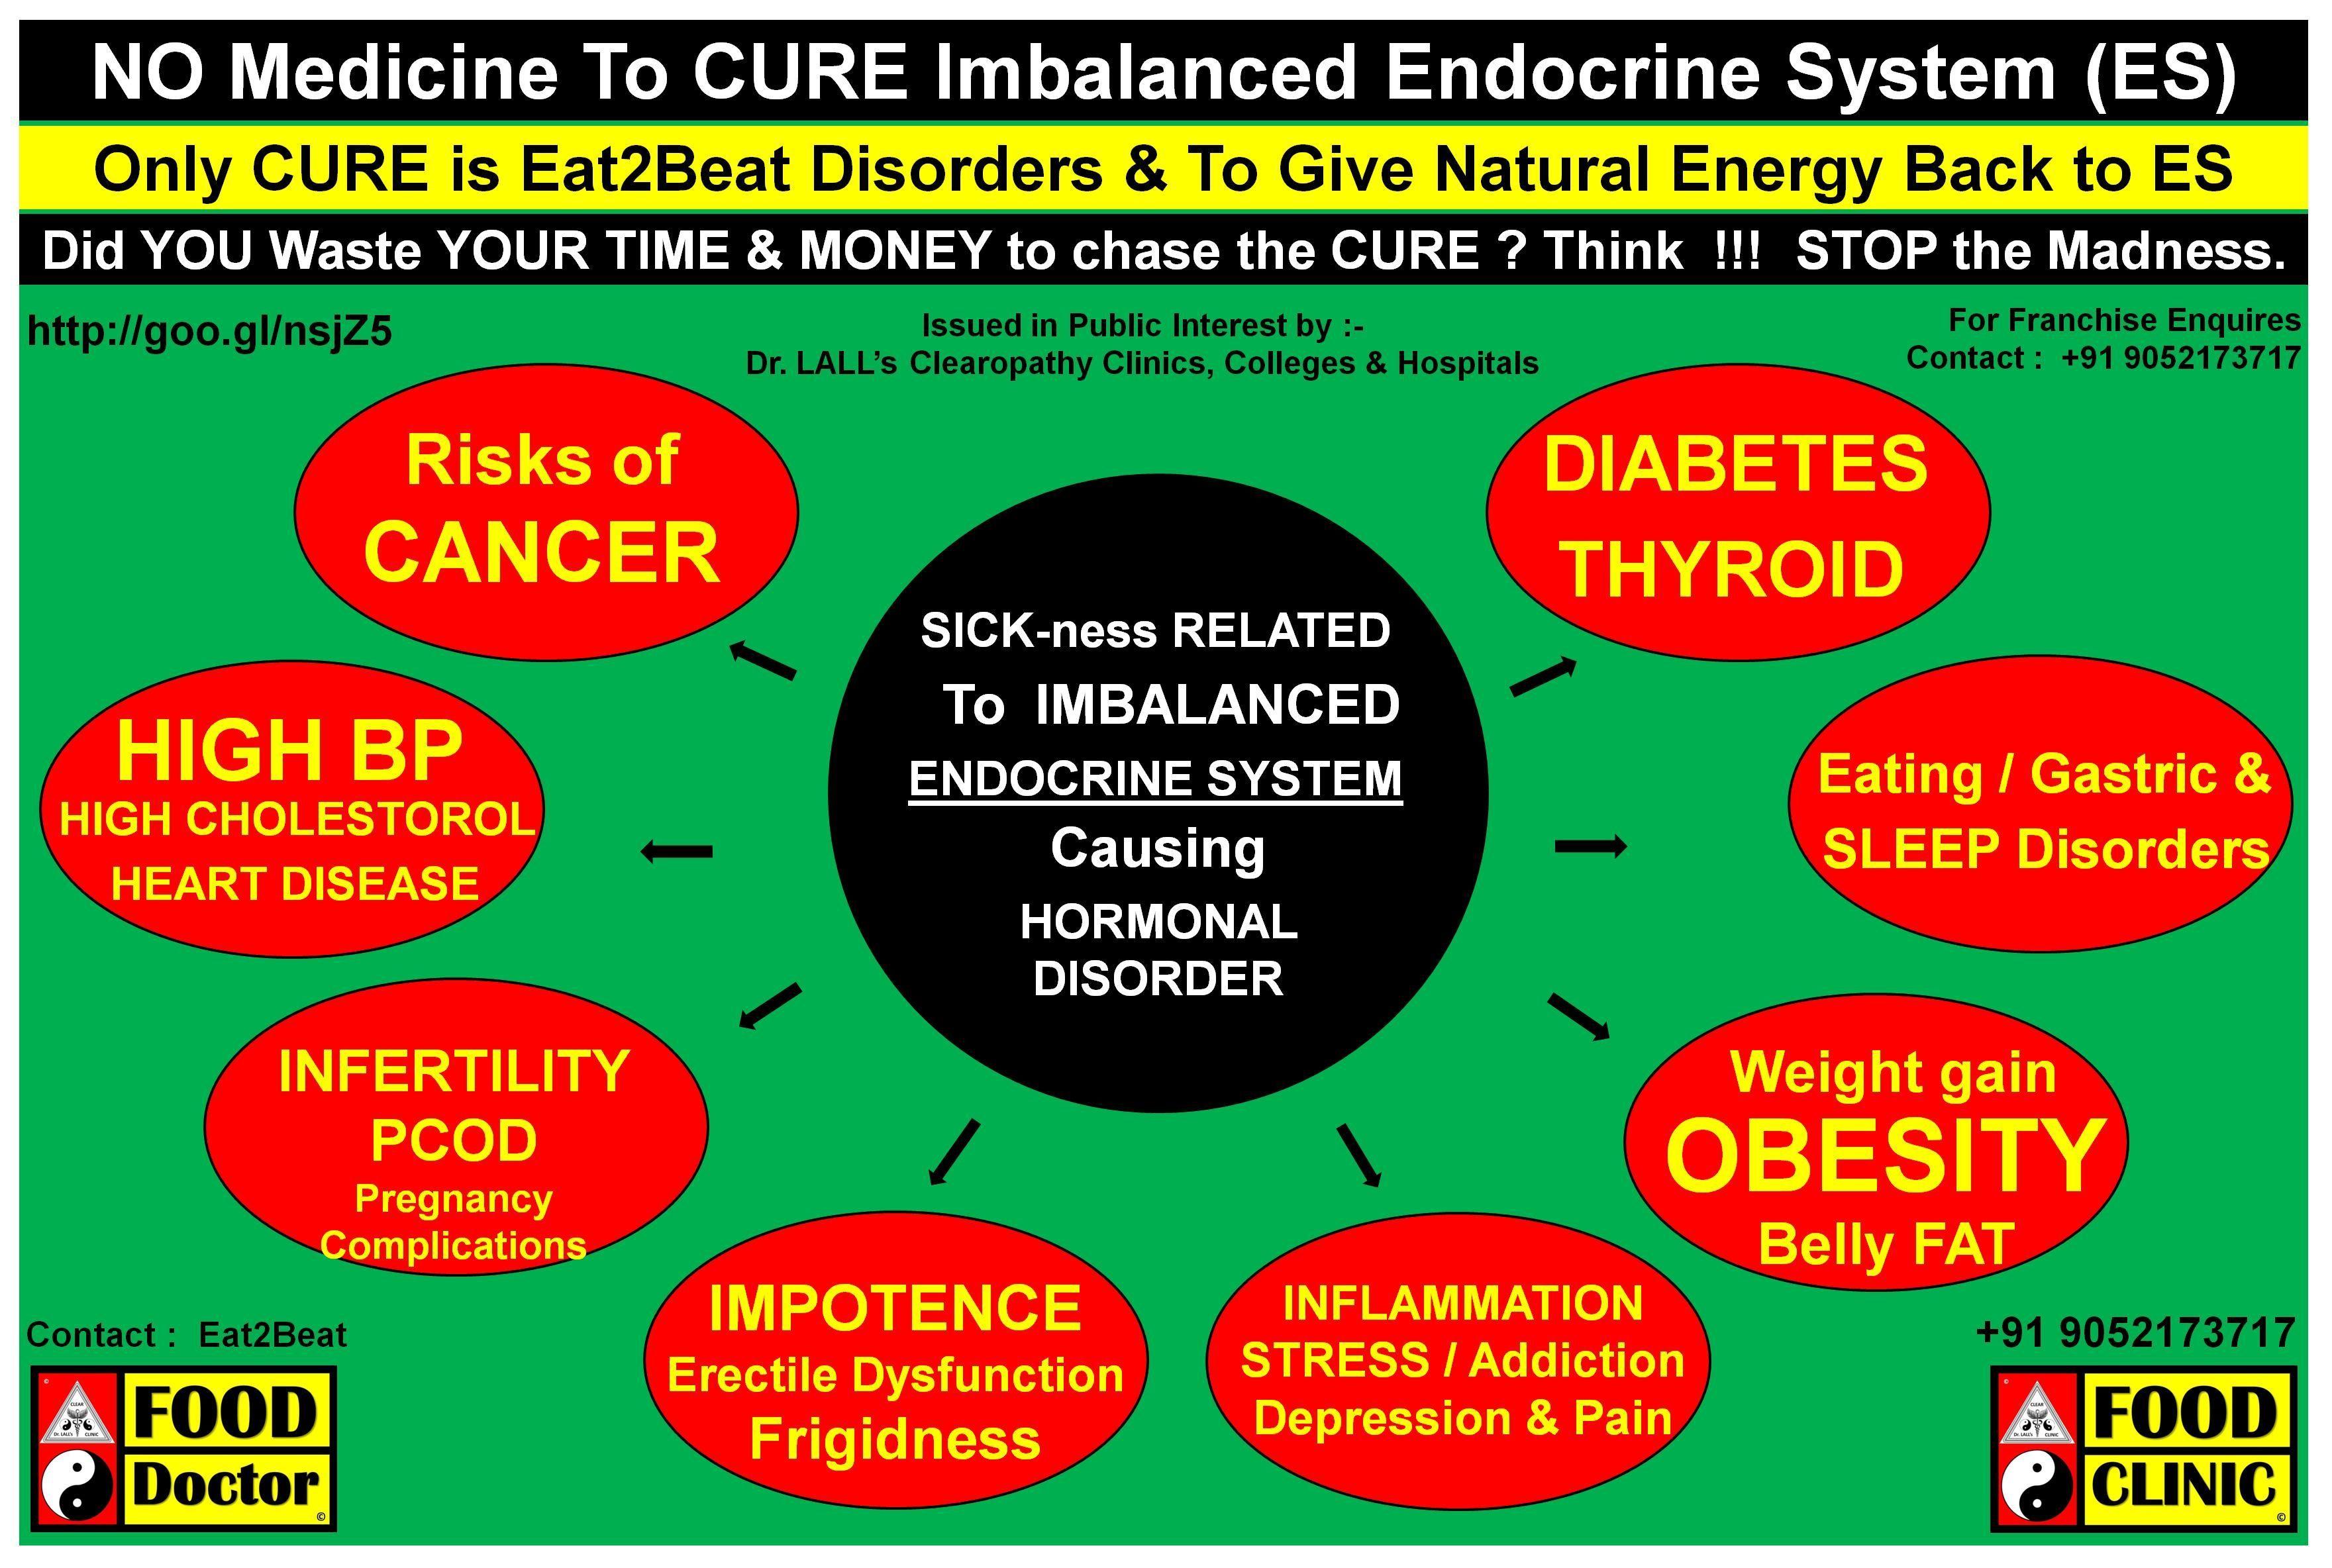 Endocrine System Disorder